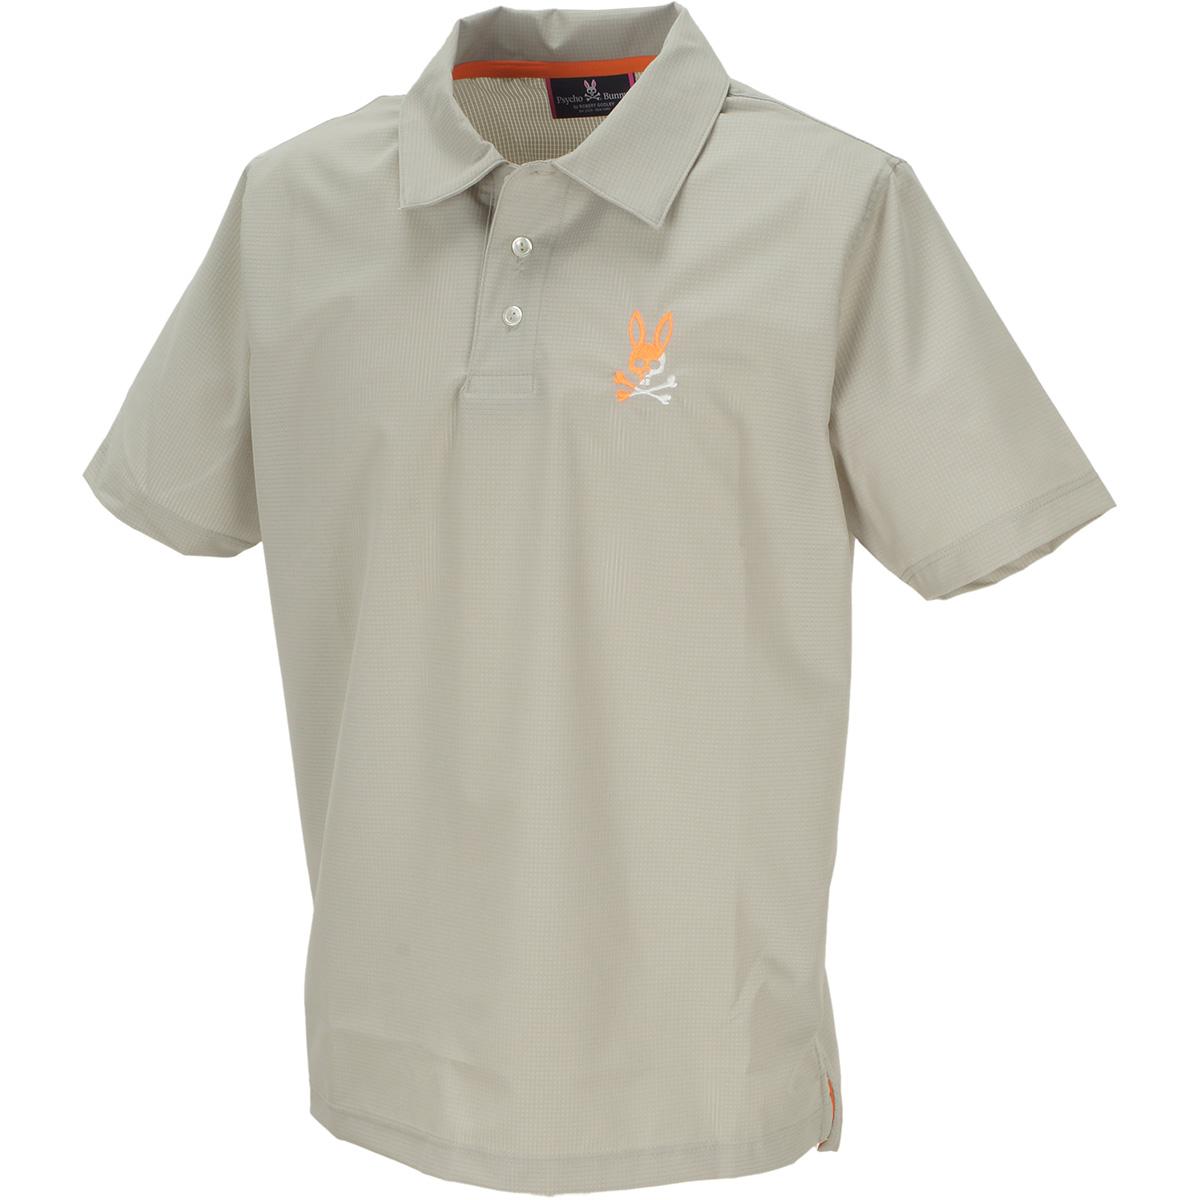 COOL DOTS スプリットバニー 半袖ポロシャツ